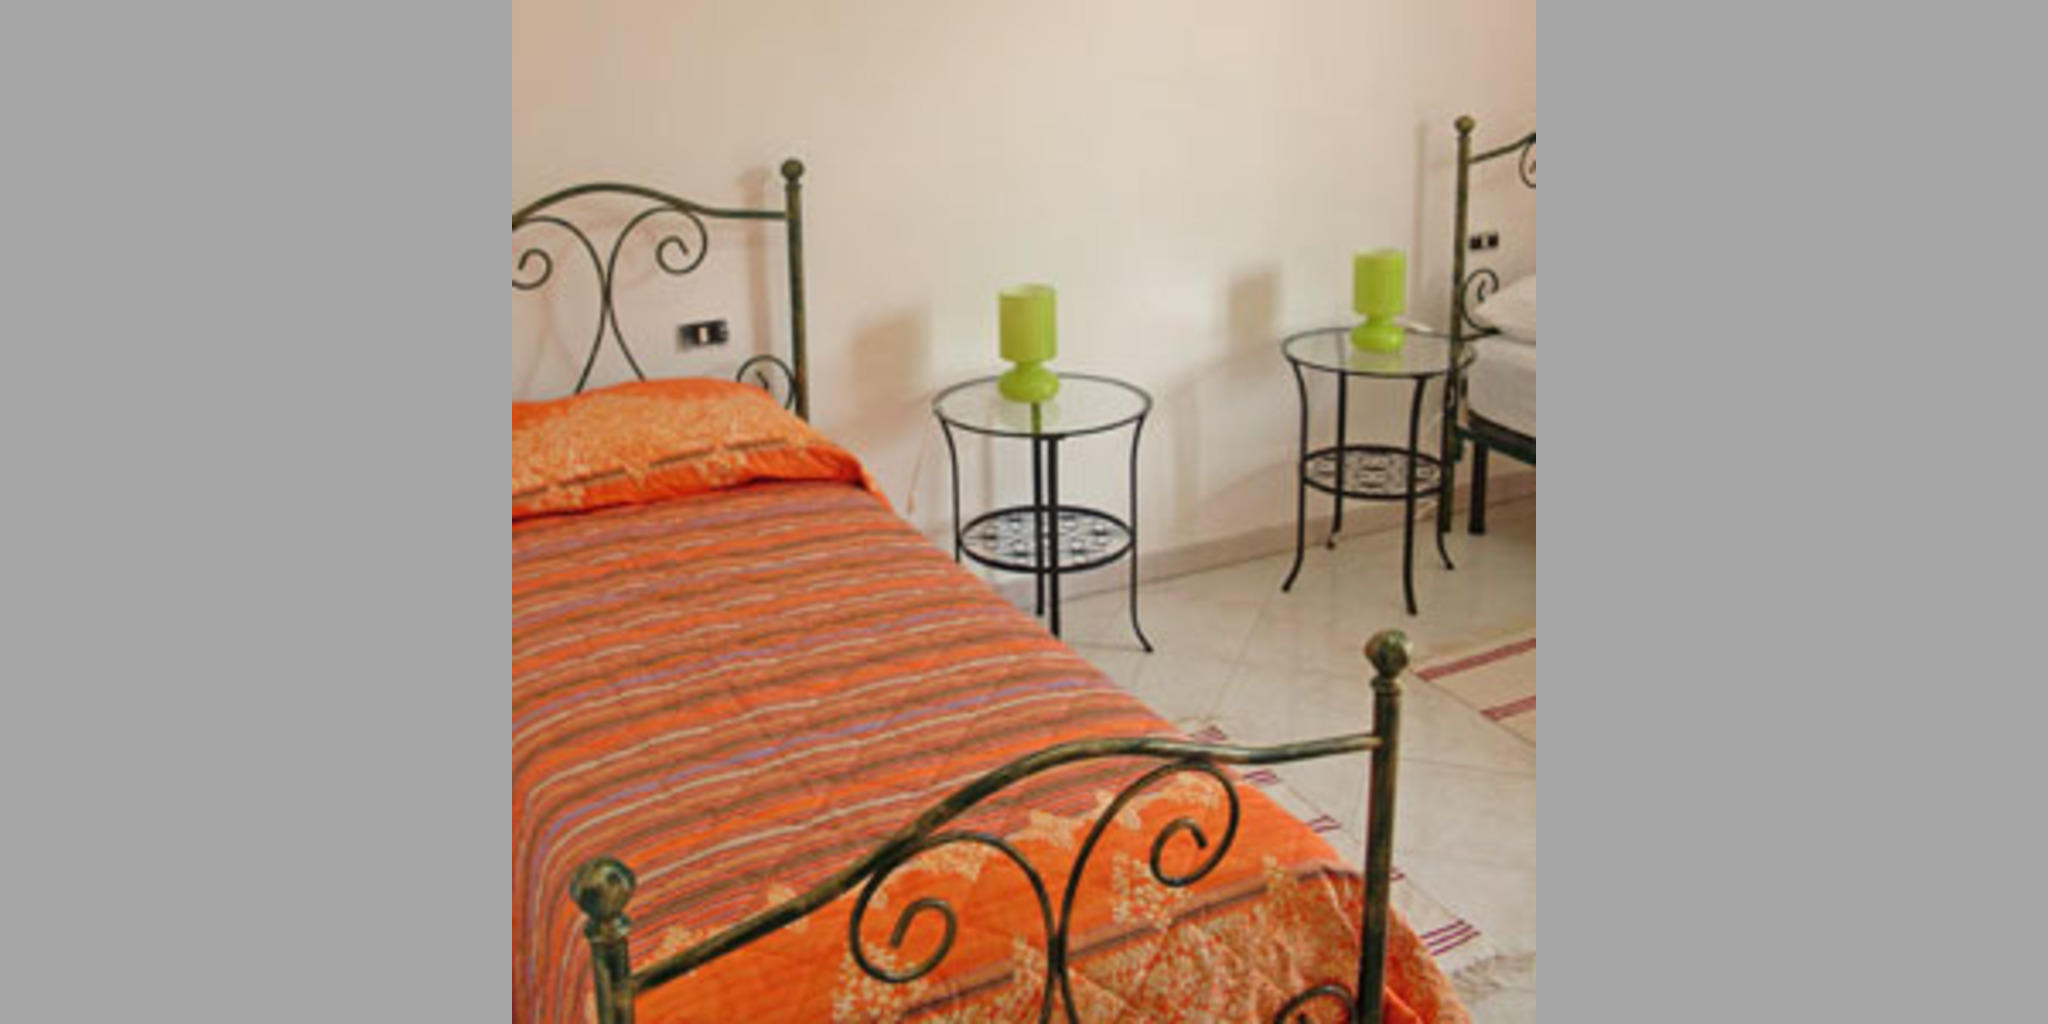 Bed & Breakfast Marigliano - Faibano